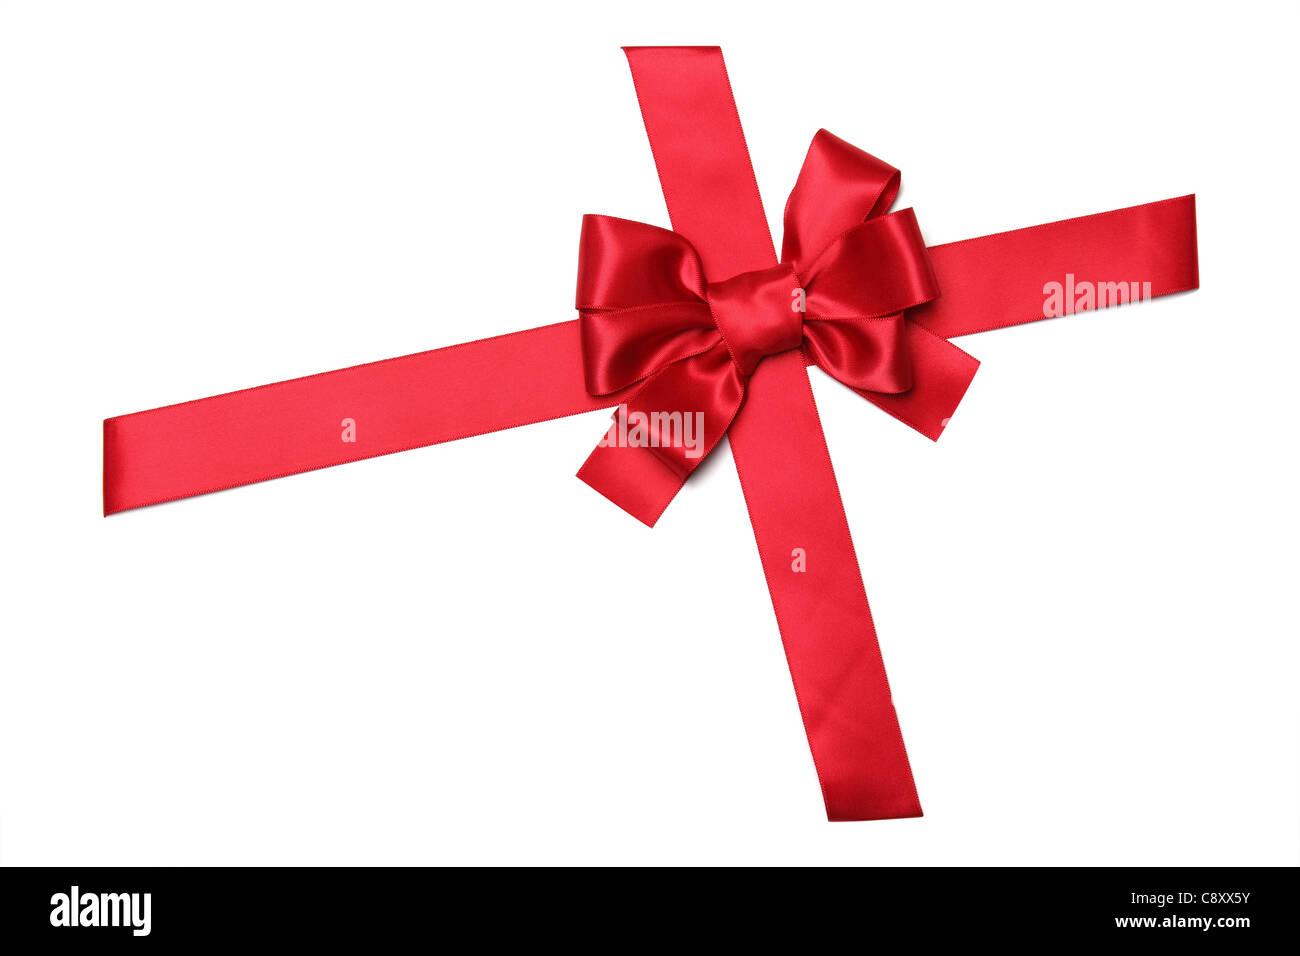 Cinta roja con arco aislado en blanco Imagen De Stock